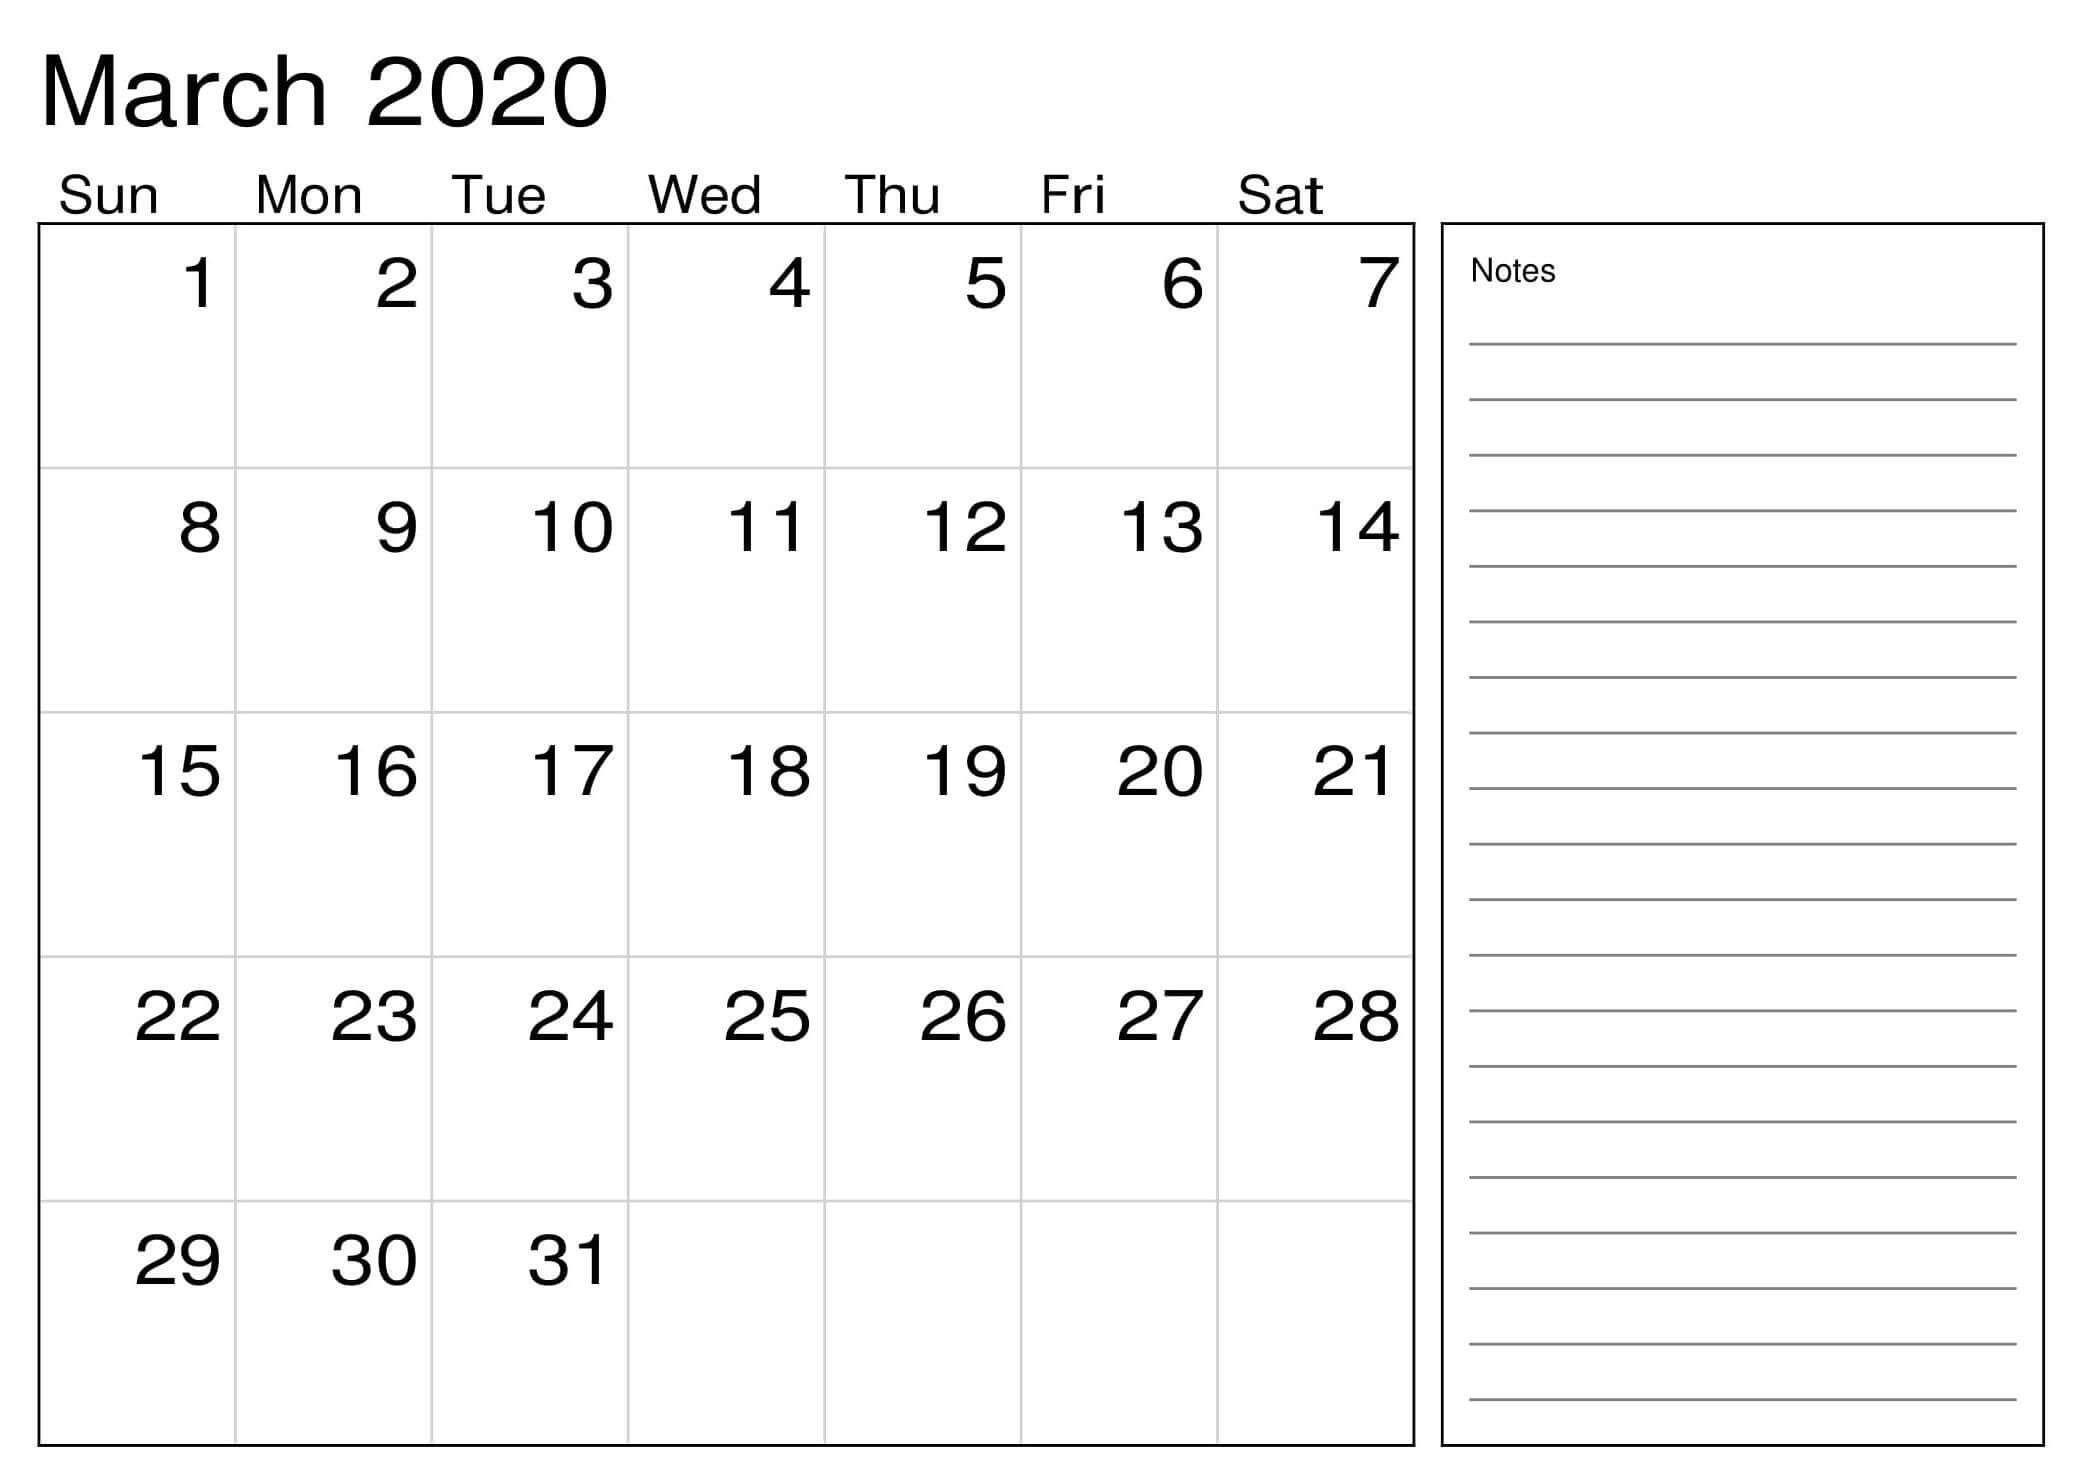 March 2020 Calendar Excel Sheet   Free Printable Calendar 2 Week Activity Calendar Editable